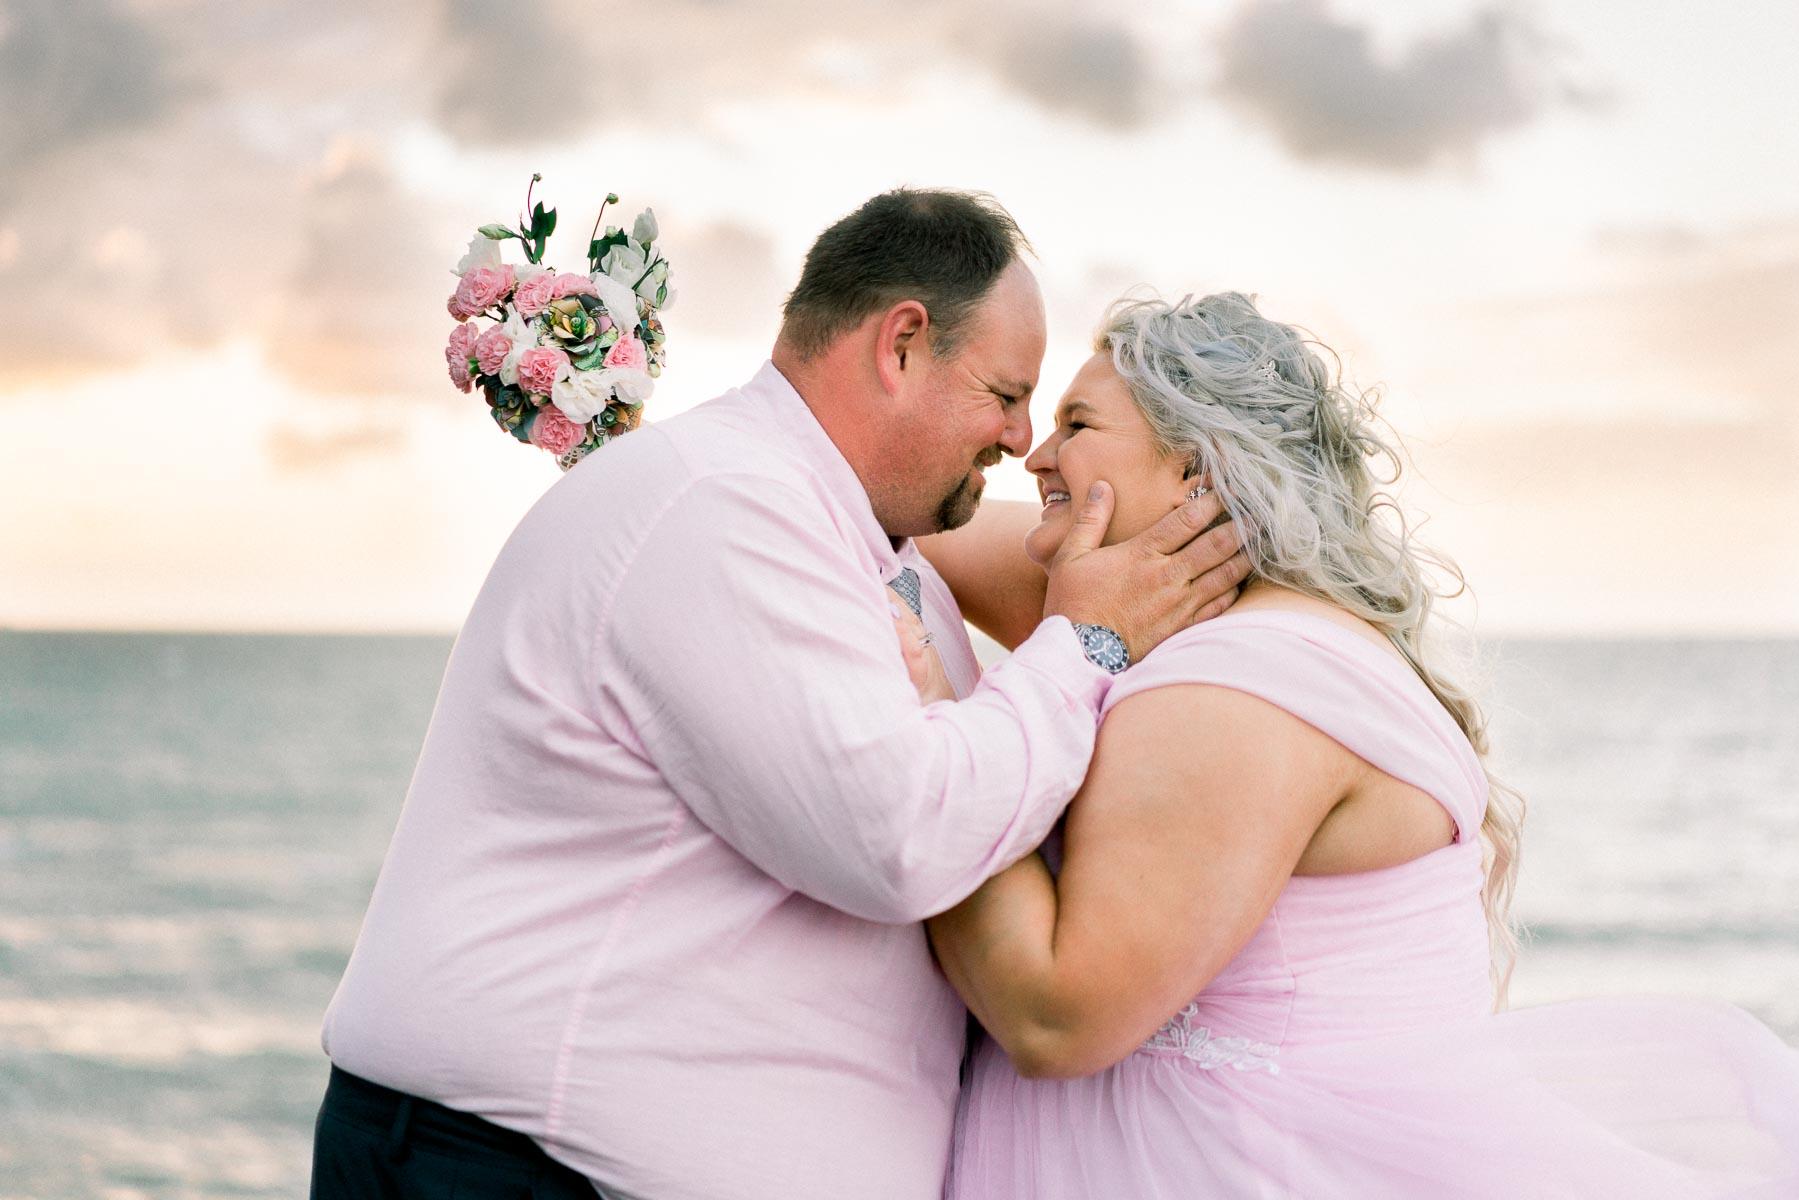 mt-eliza-mornington-peninsula-backyard-wedding-heart+soul-weddings-allison-matt-04123.jpg